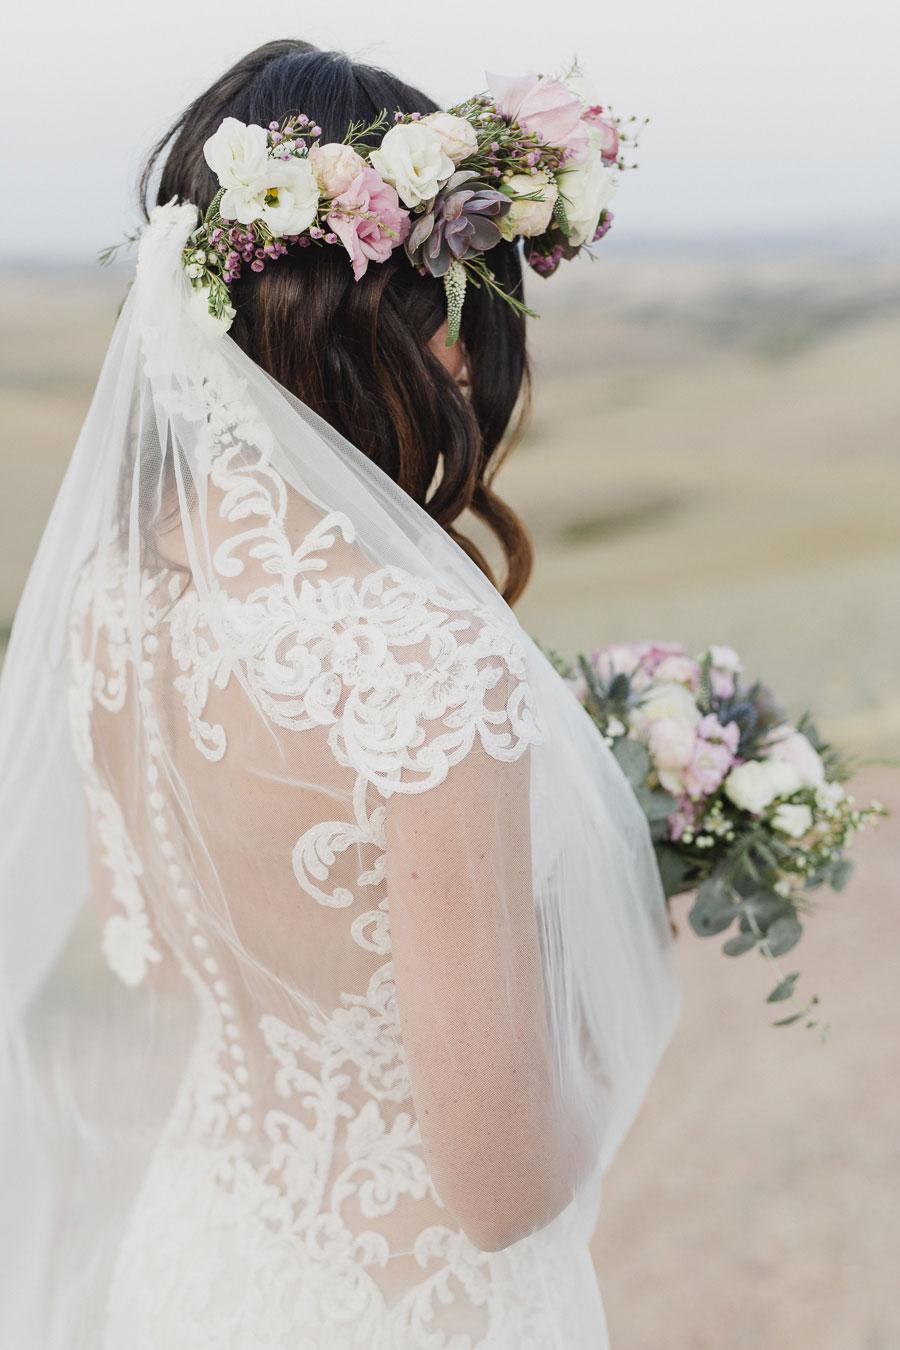 Wedding-Nicholad-and-Federica-Giuseppe-Giovannelli-165